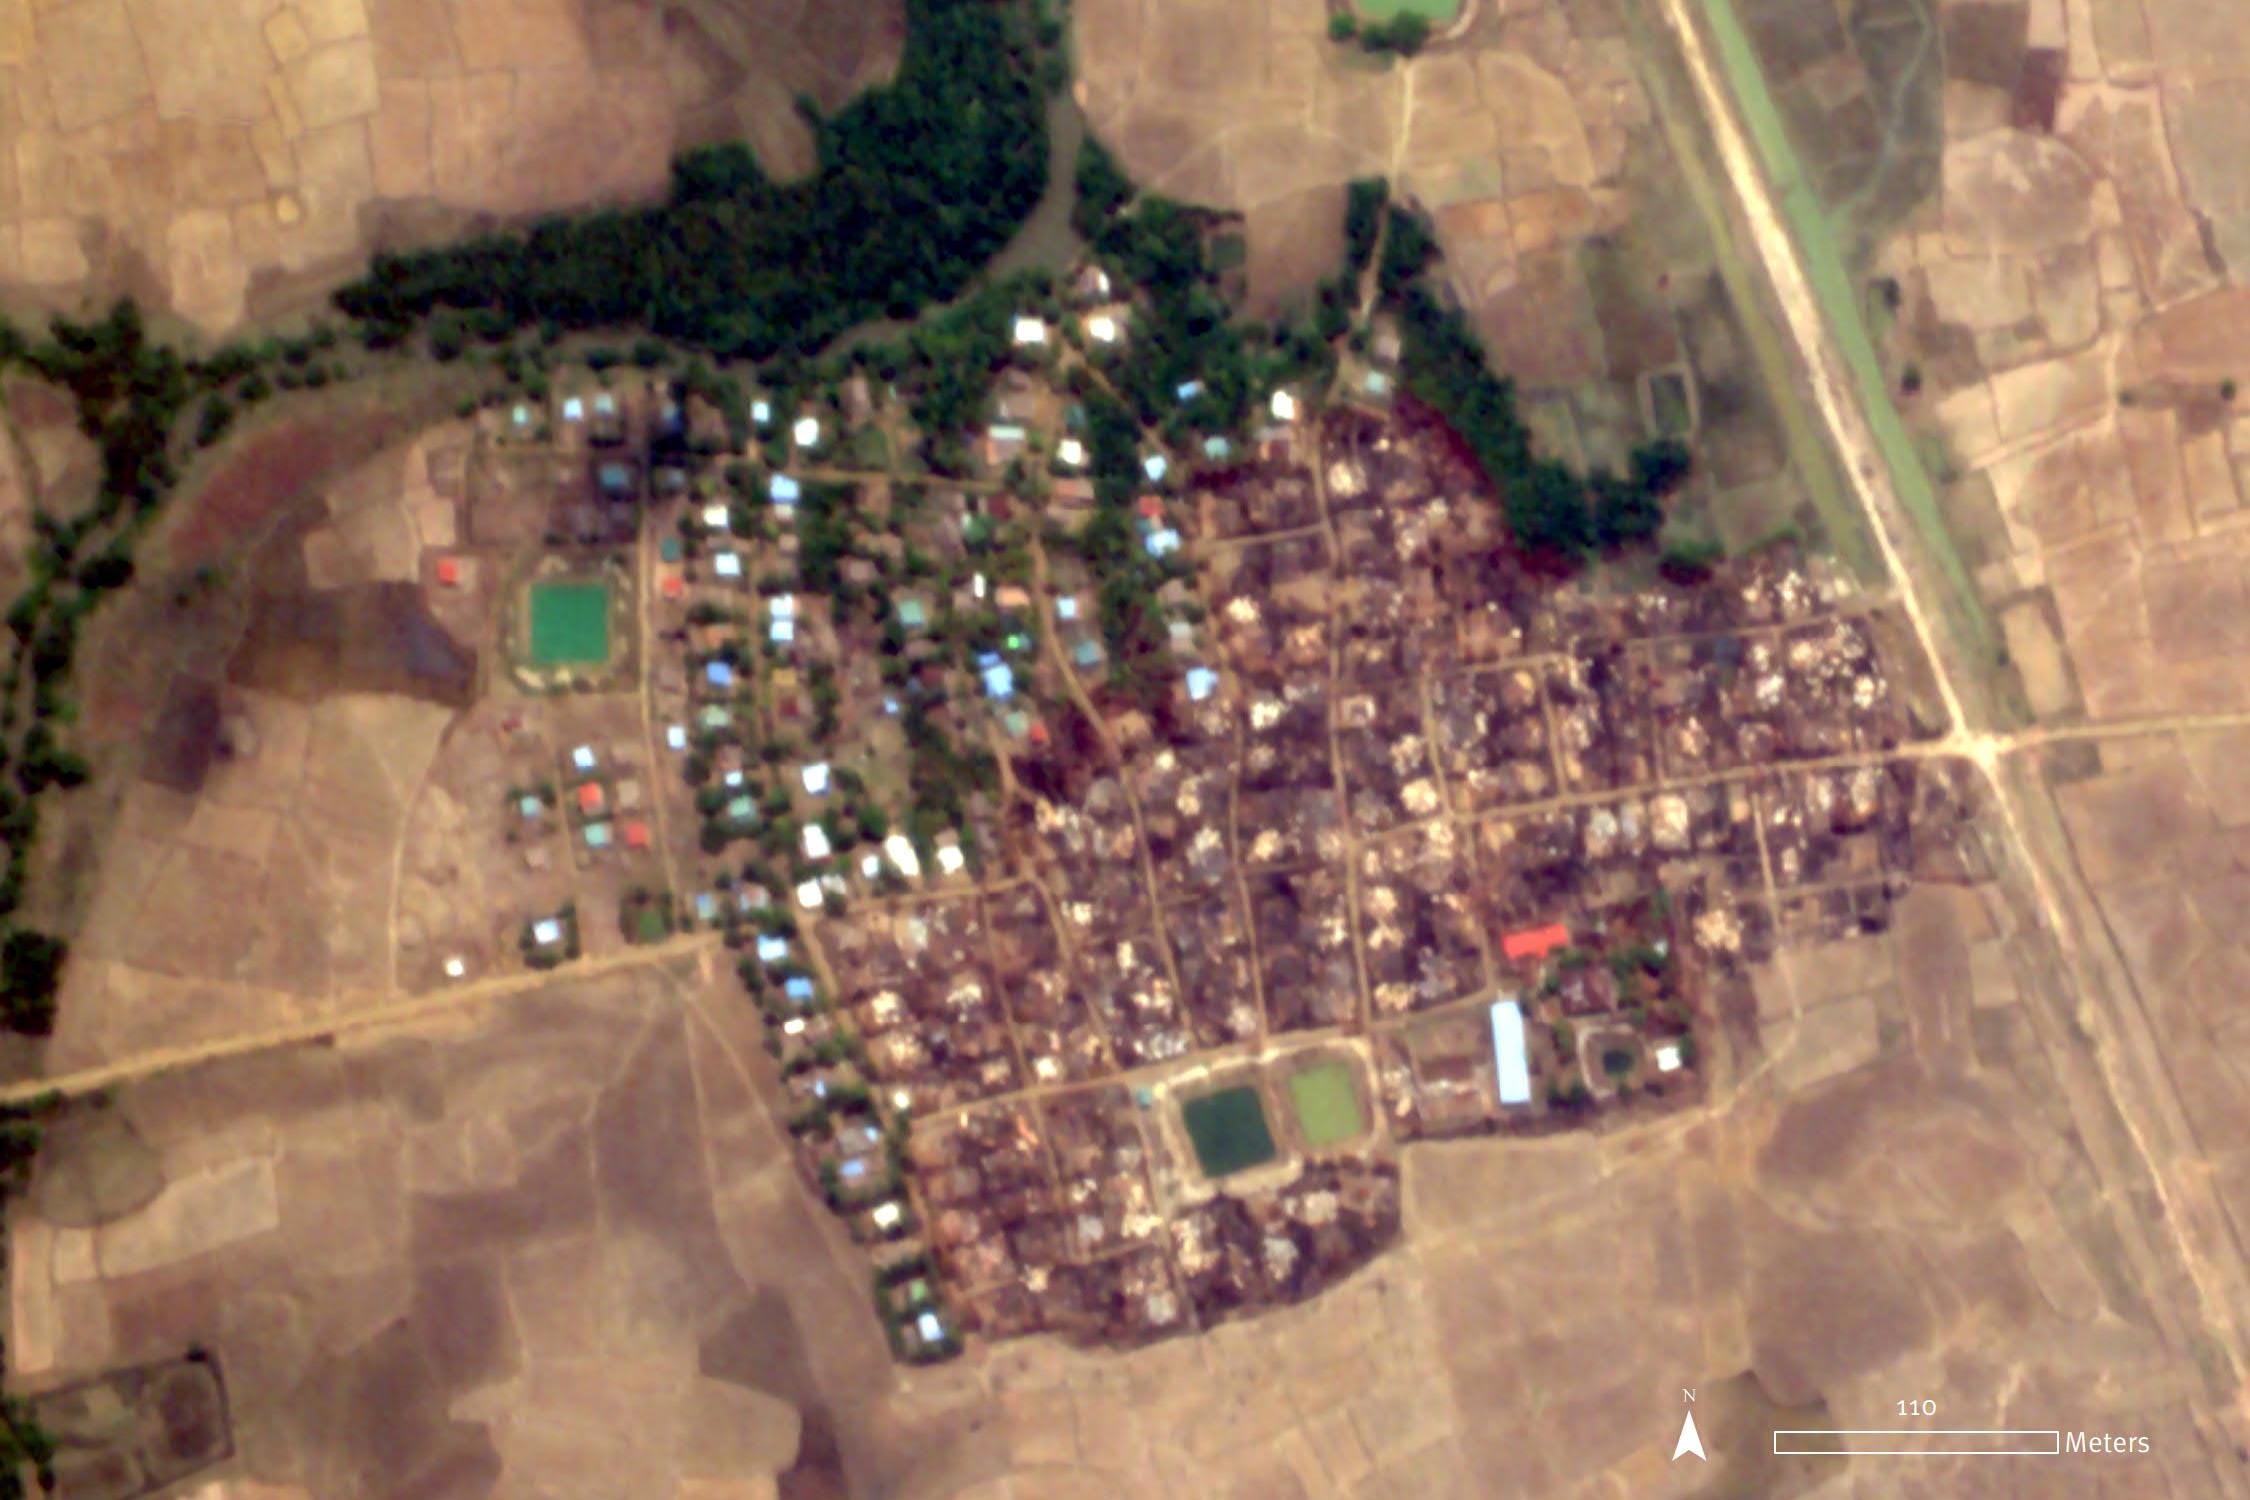 Satellite Imagery Shows Myanmar Military's Arson Attack on Rural Rakhine Village, HRW Says